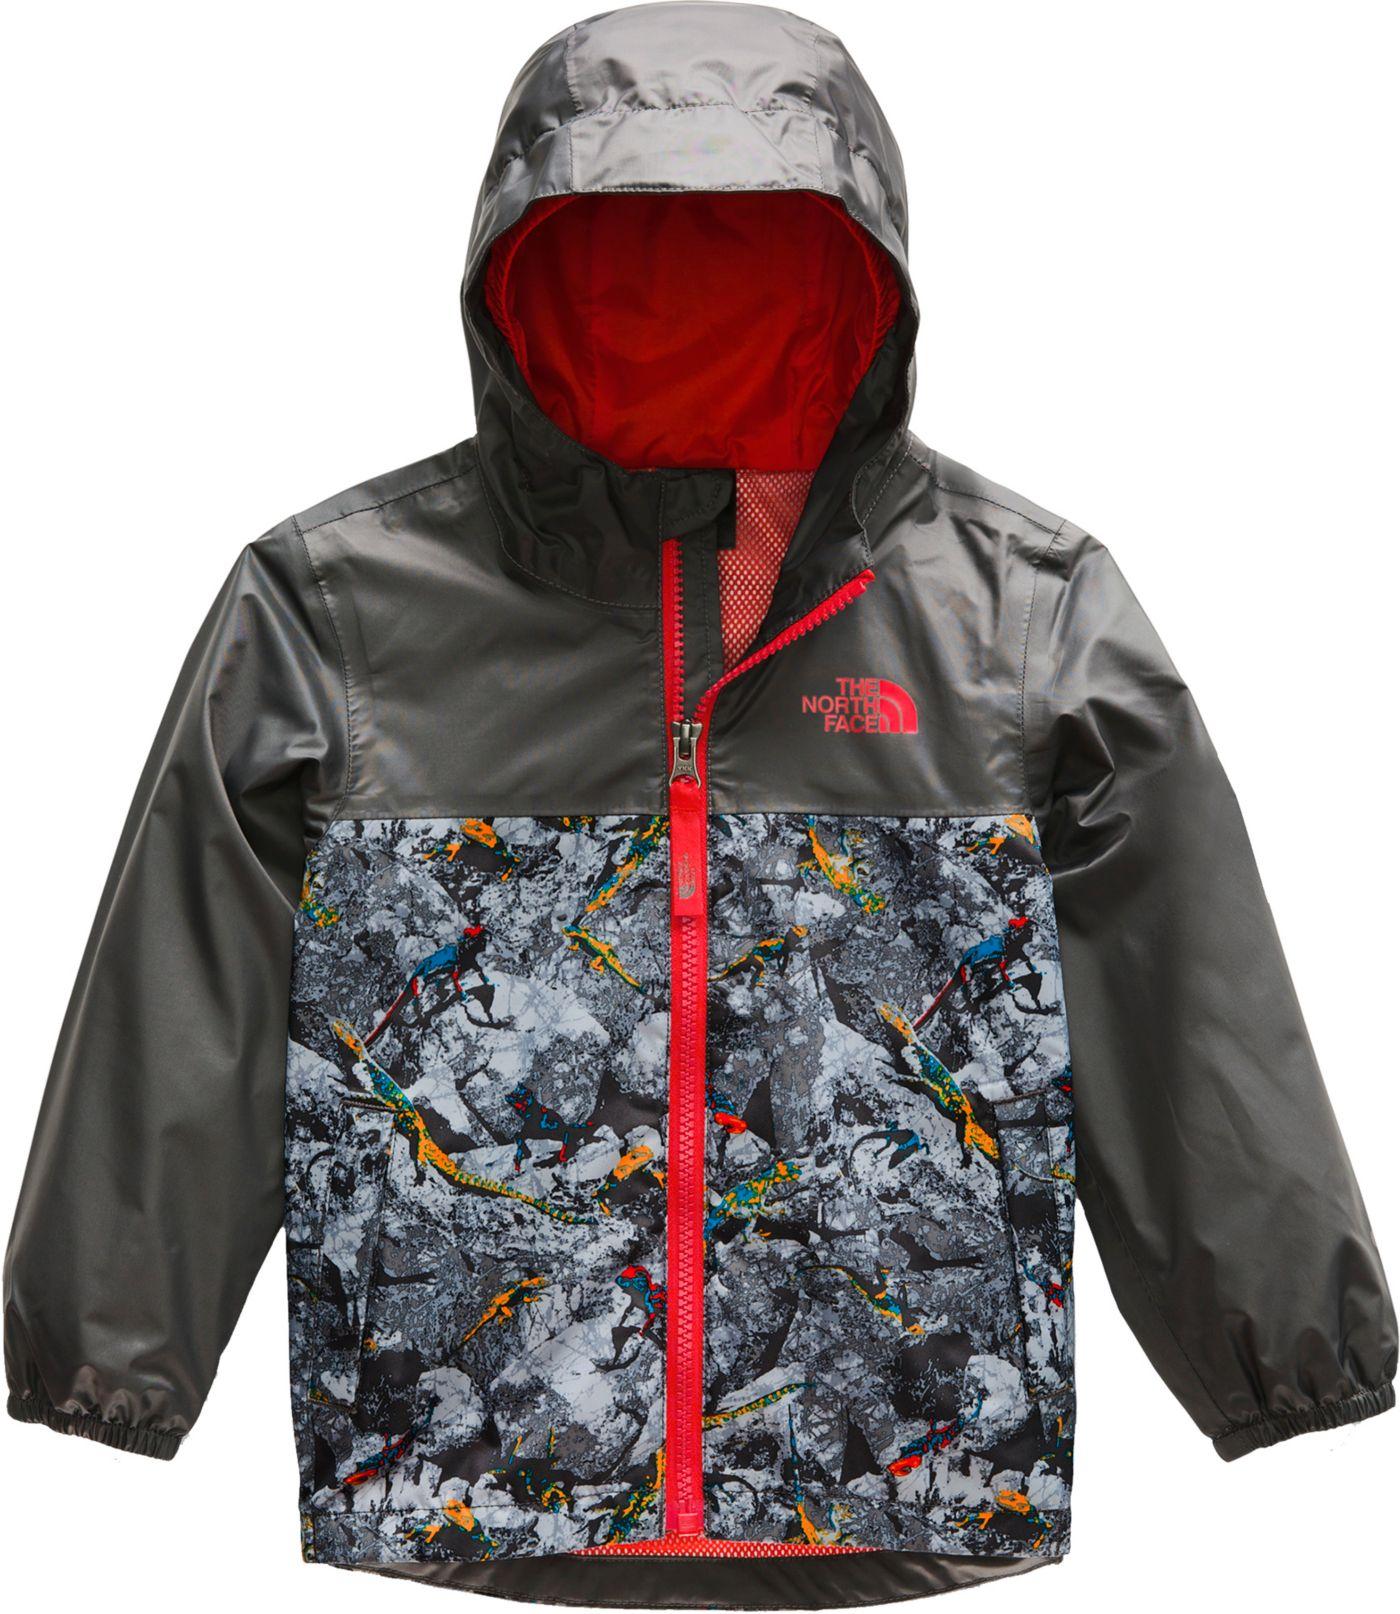 The North Face Toddler Zipline Rain Jacket